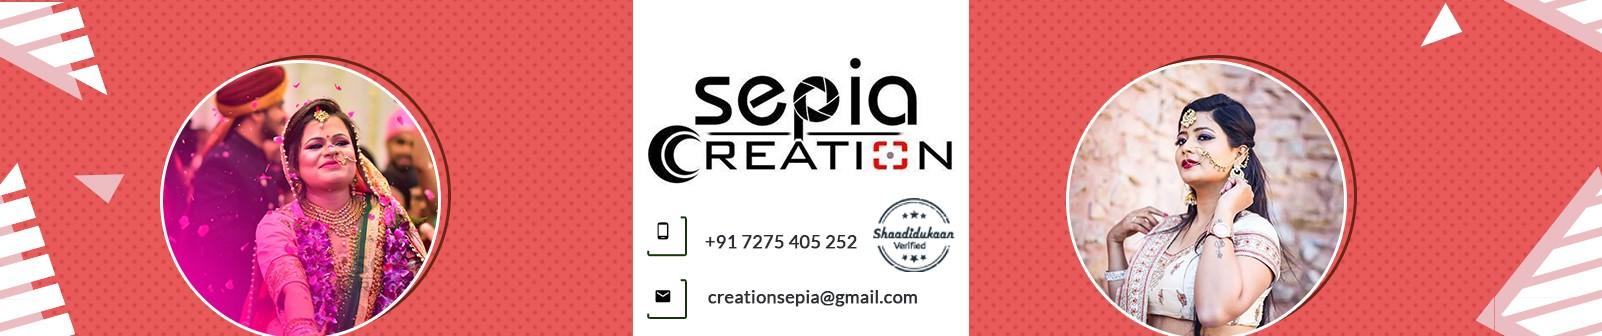 Sepia Creation